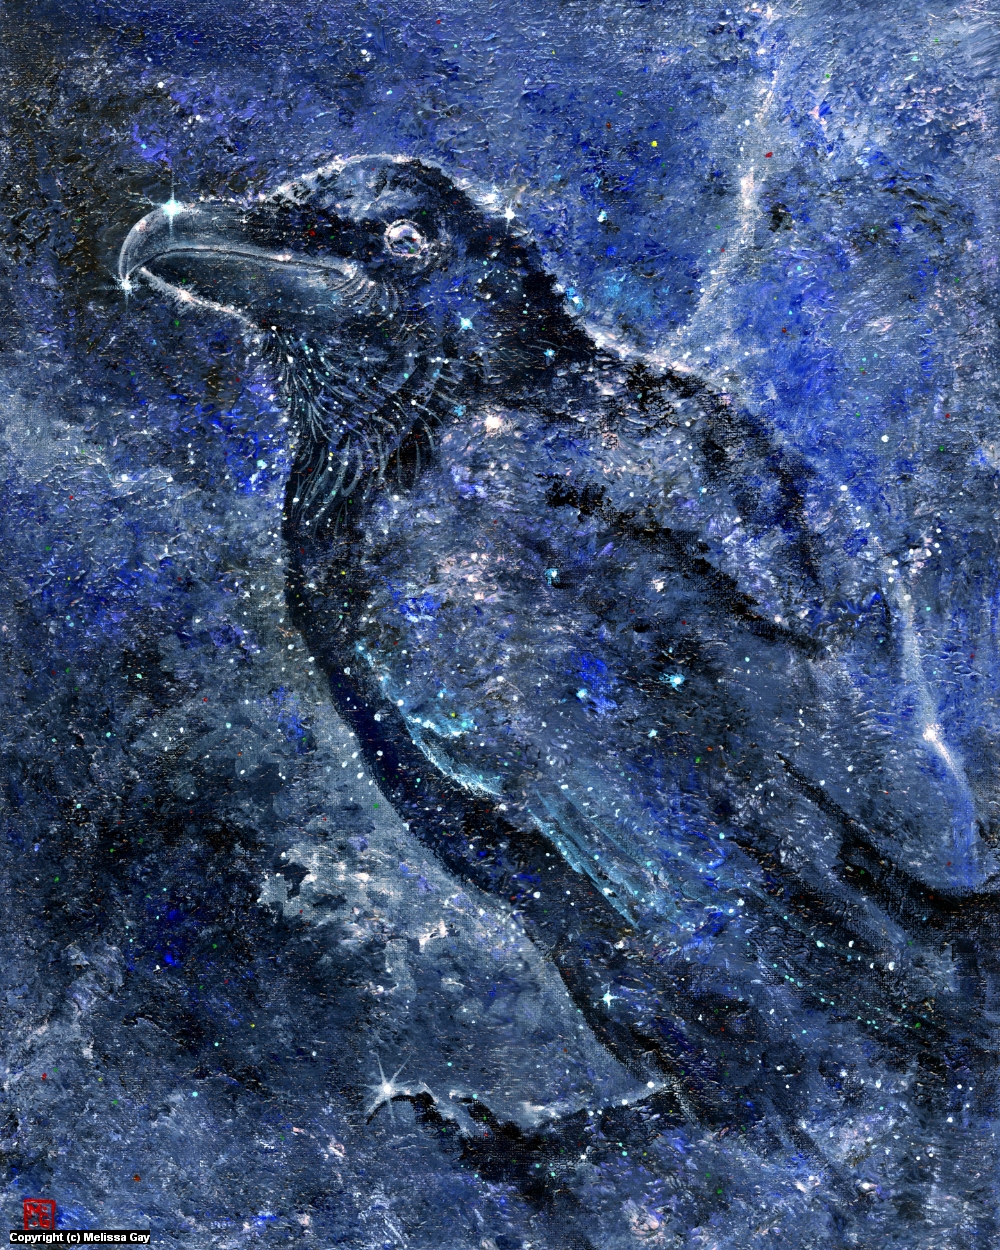 Cosmic Raven Artwork by Melissa Gay